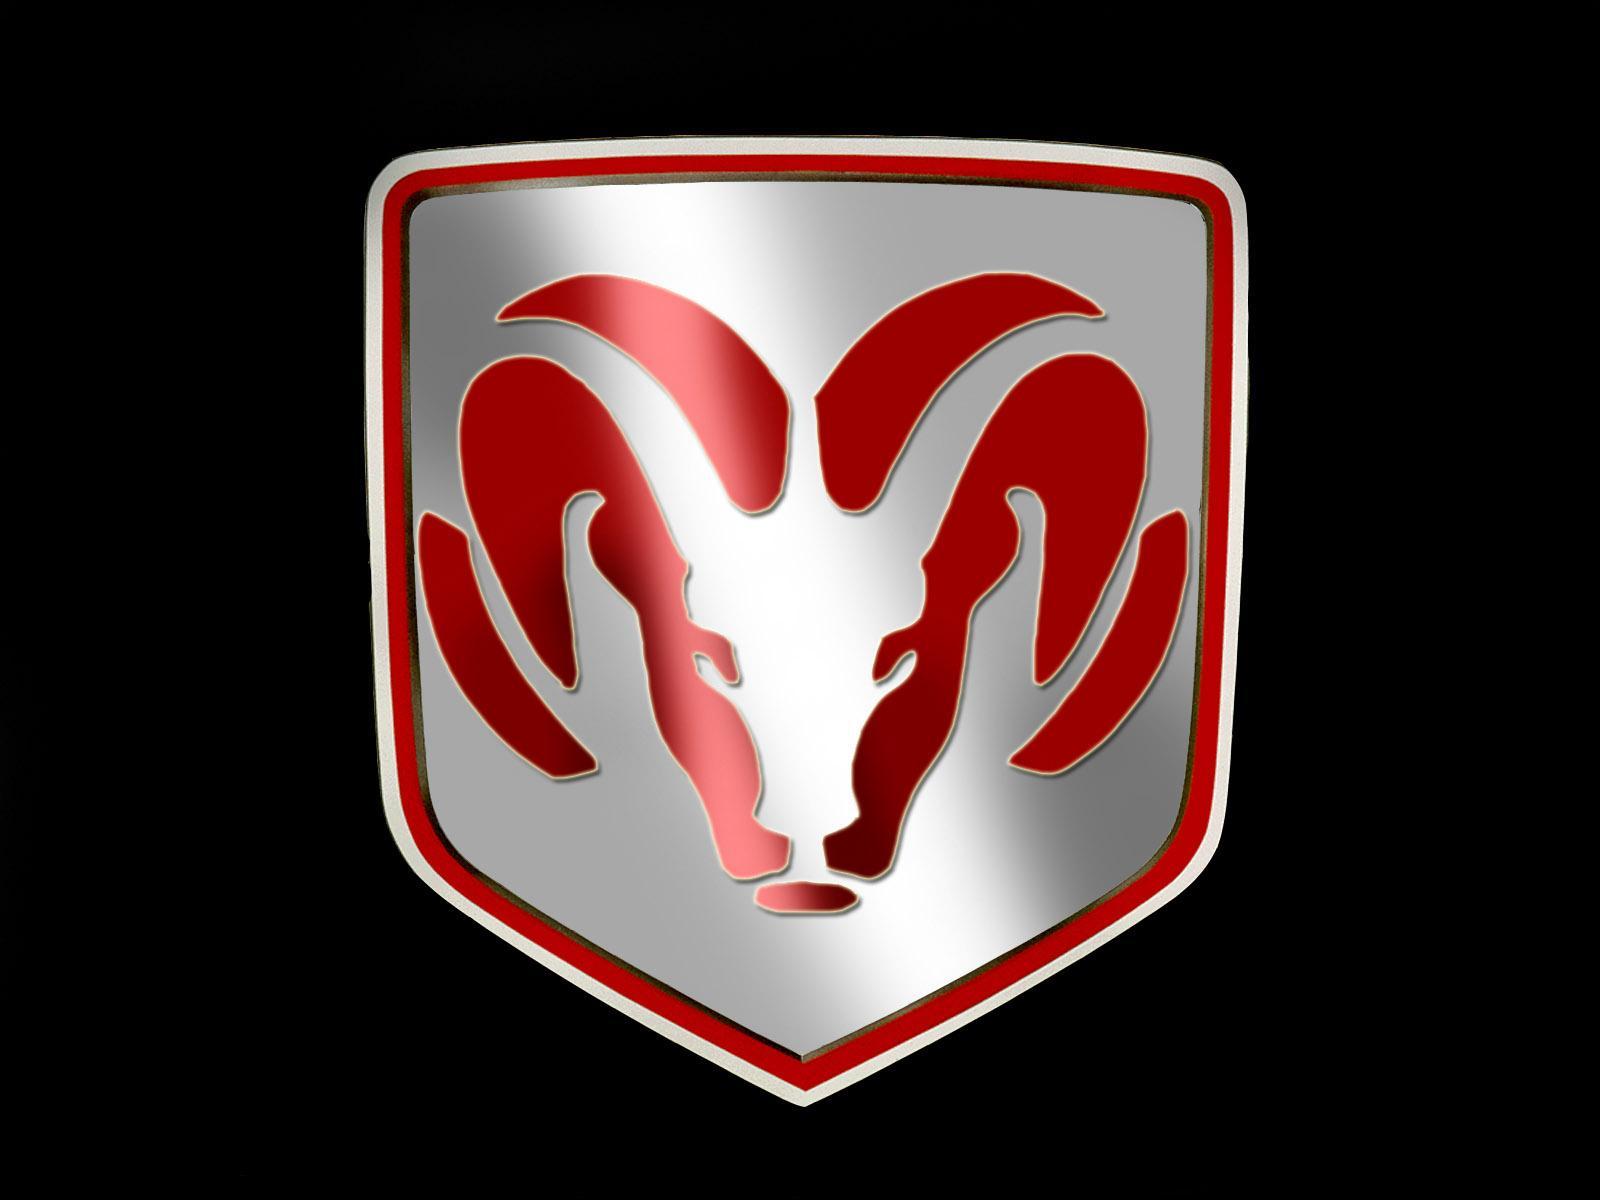 Red Dodge logo symbols